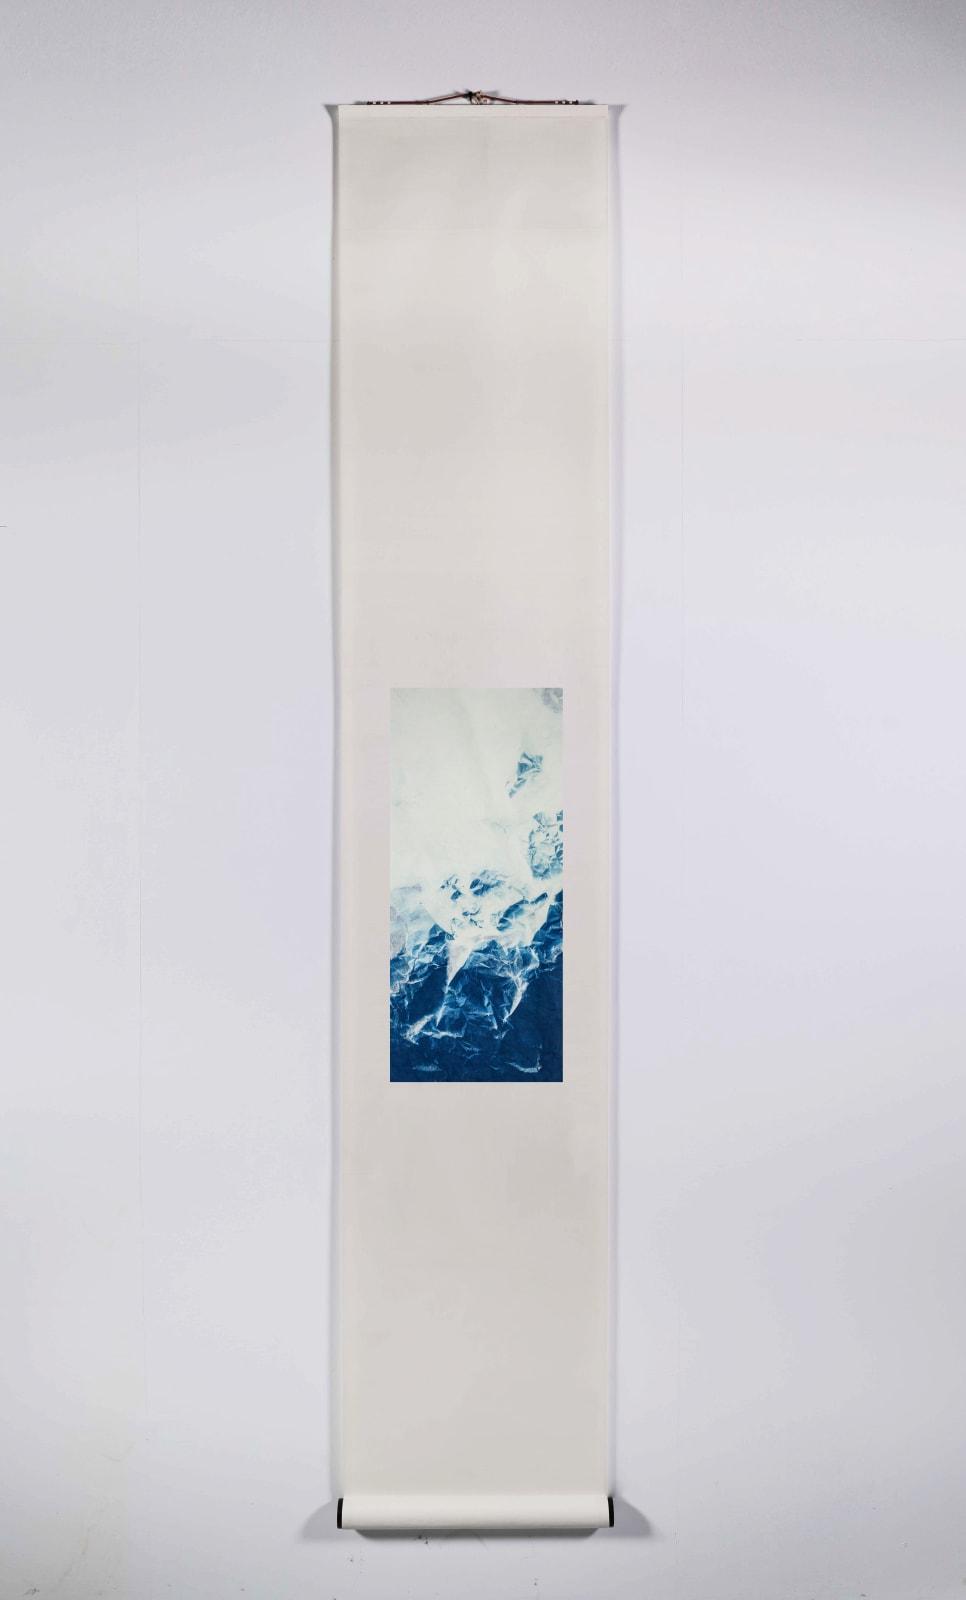 Wu Chi-Tsung 吳季璁, Wrinkled Texture 036 皴法習作之三十六, 2015